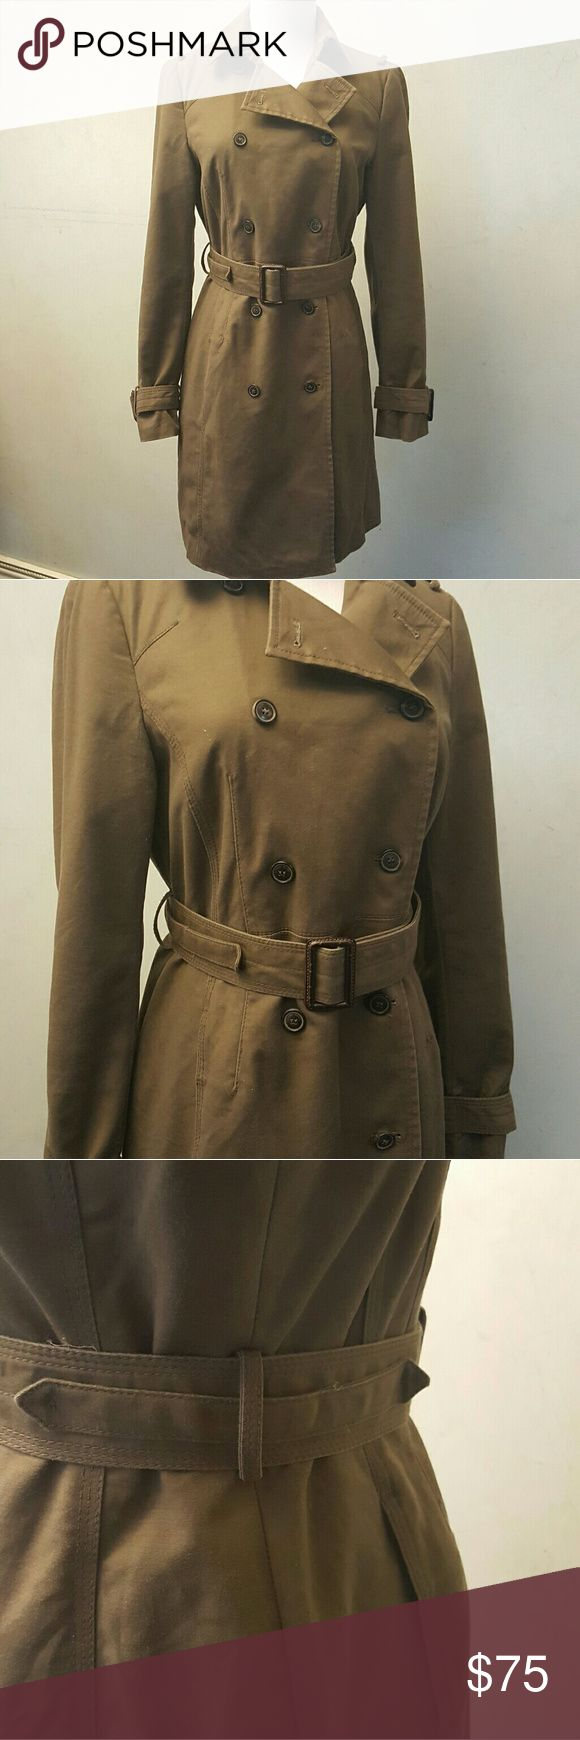 Zara brown trench coat Zara basic brown trench coat, in great condition Zara Jackets & Coats Trench Coats